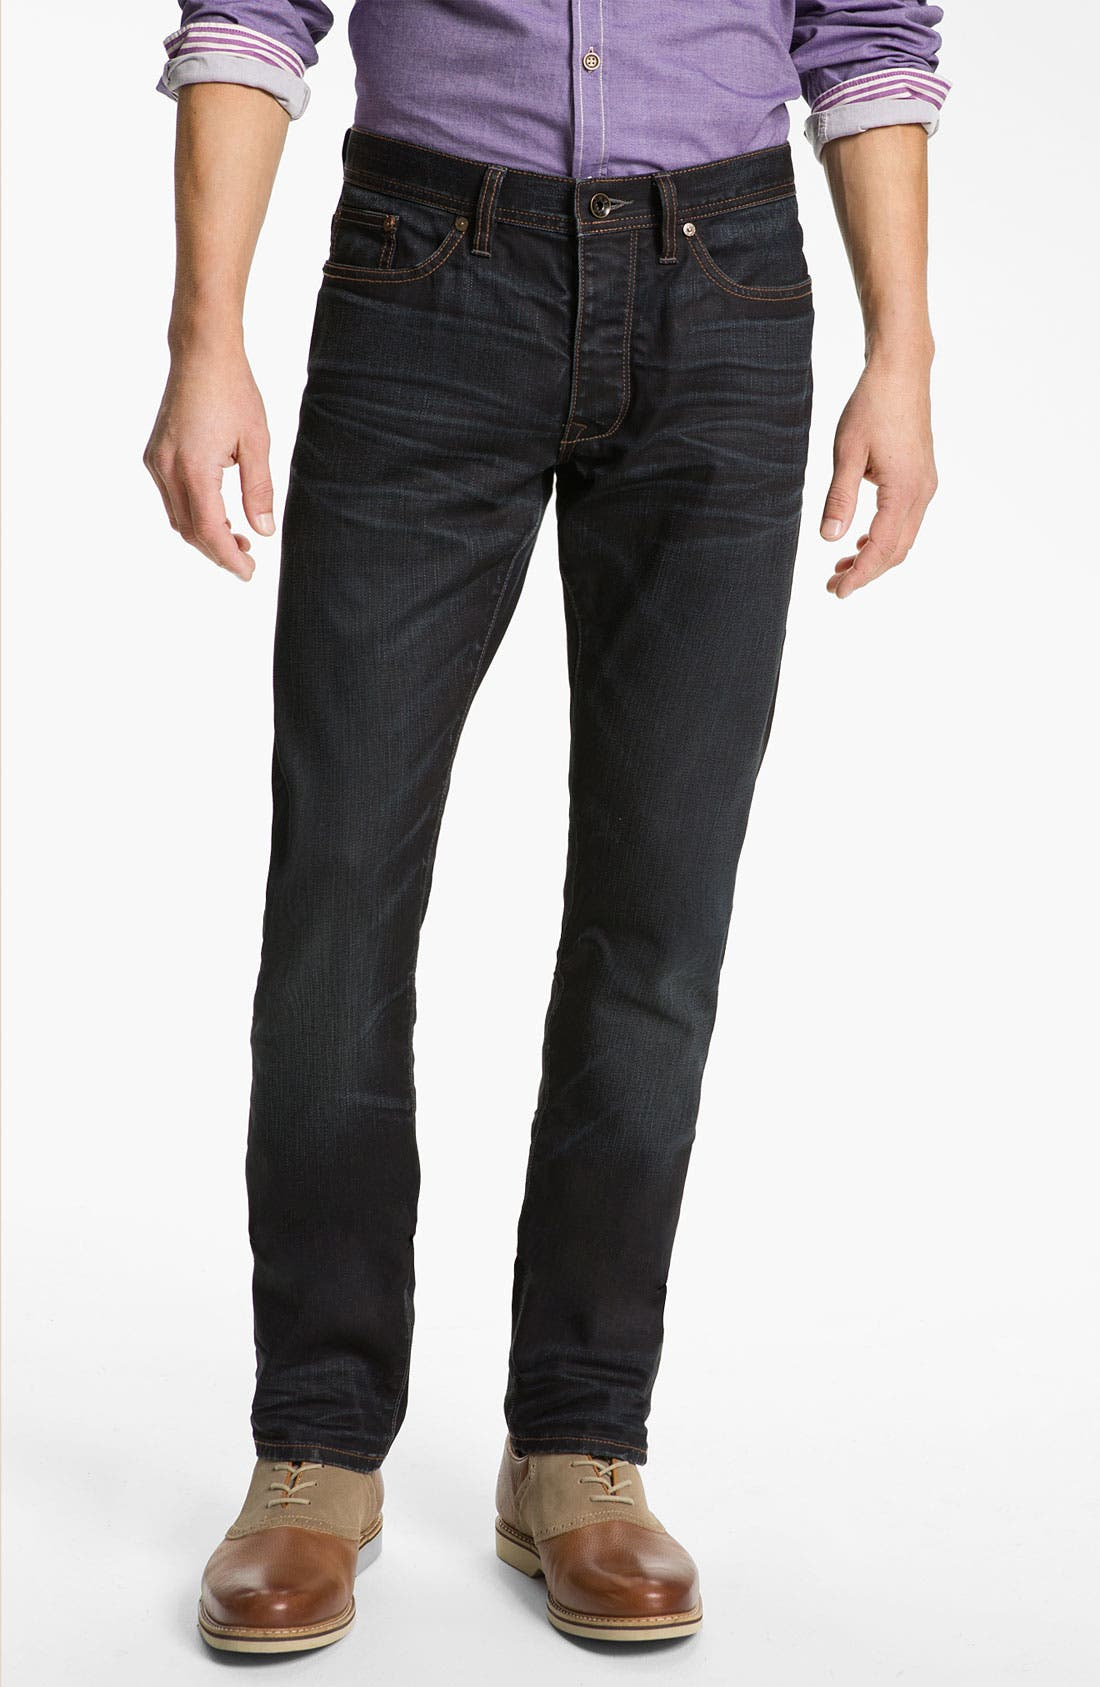 Alternate Image 1 Selected - John Varvatos 'Bowery' Slim Straight Leg Jeans (Ink)